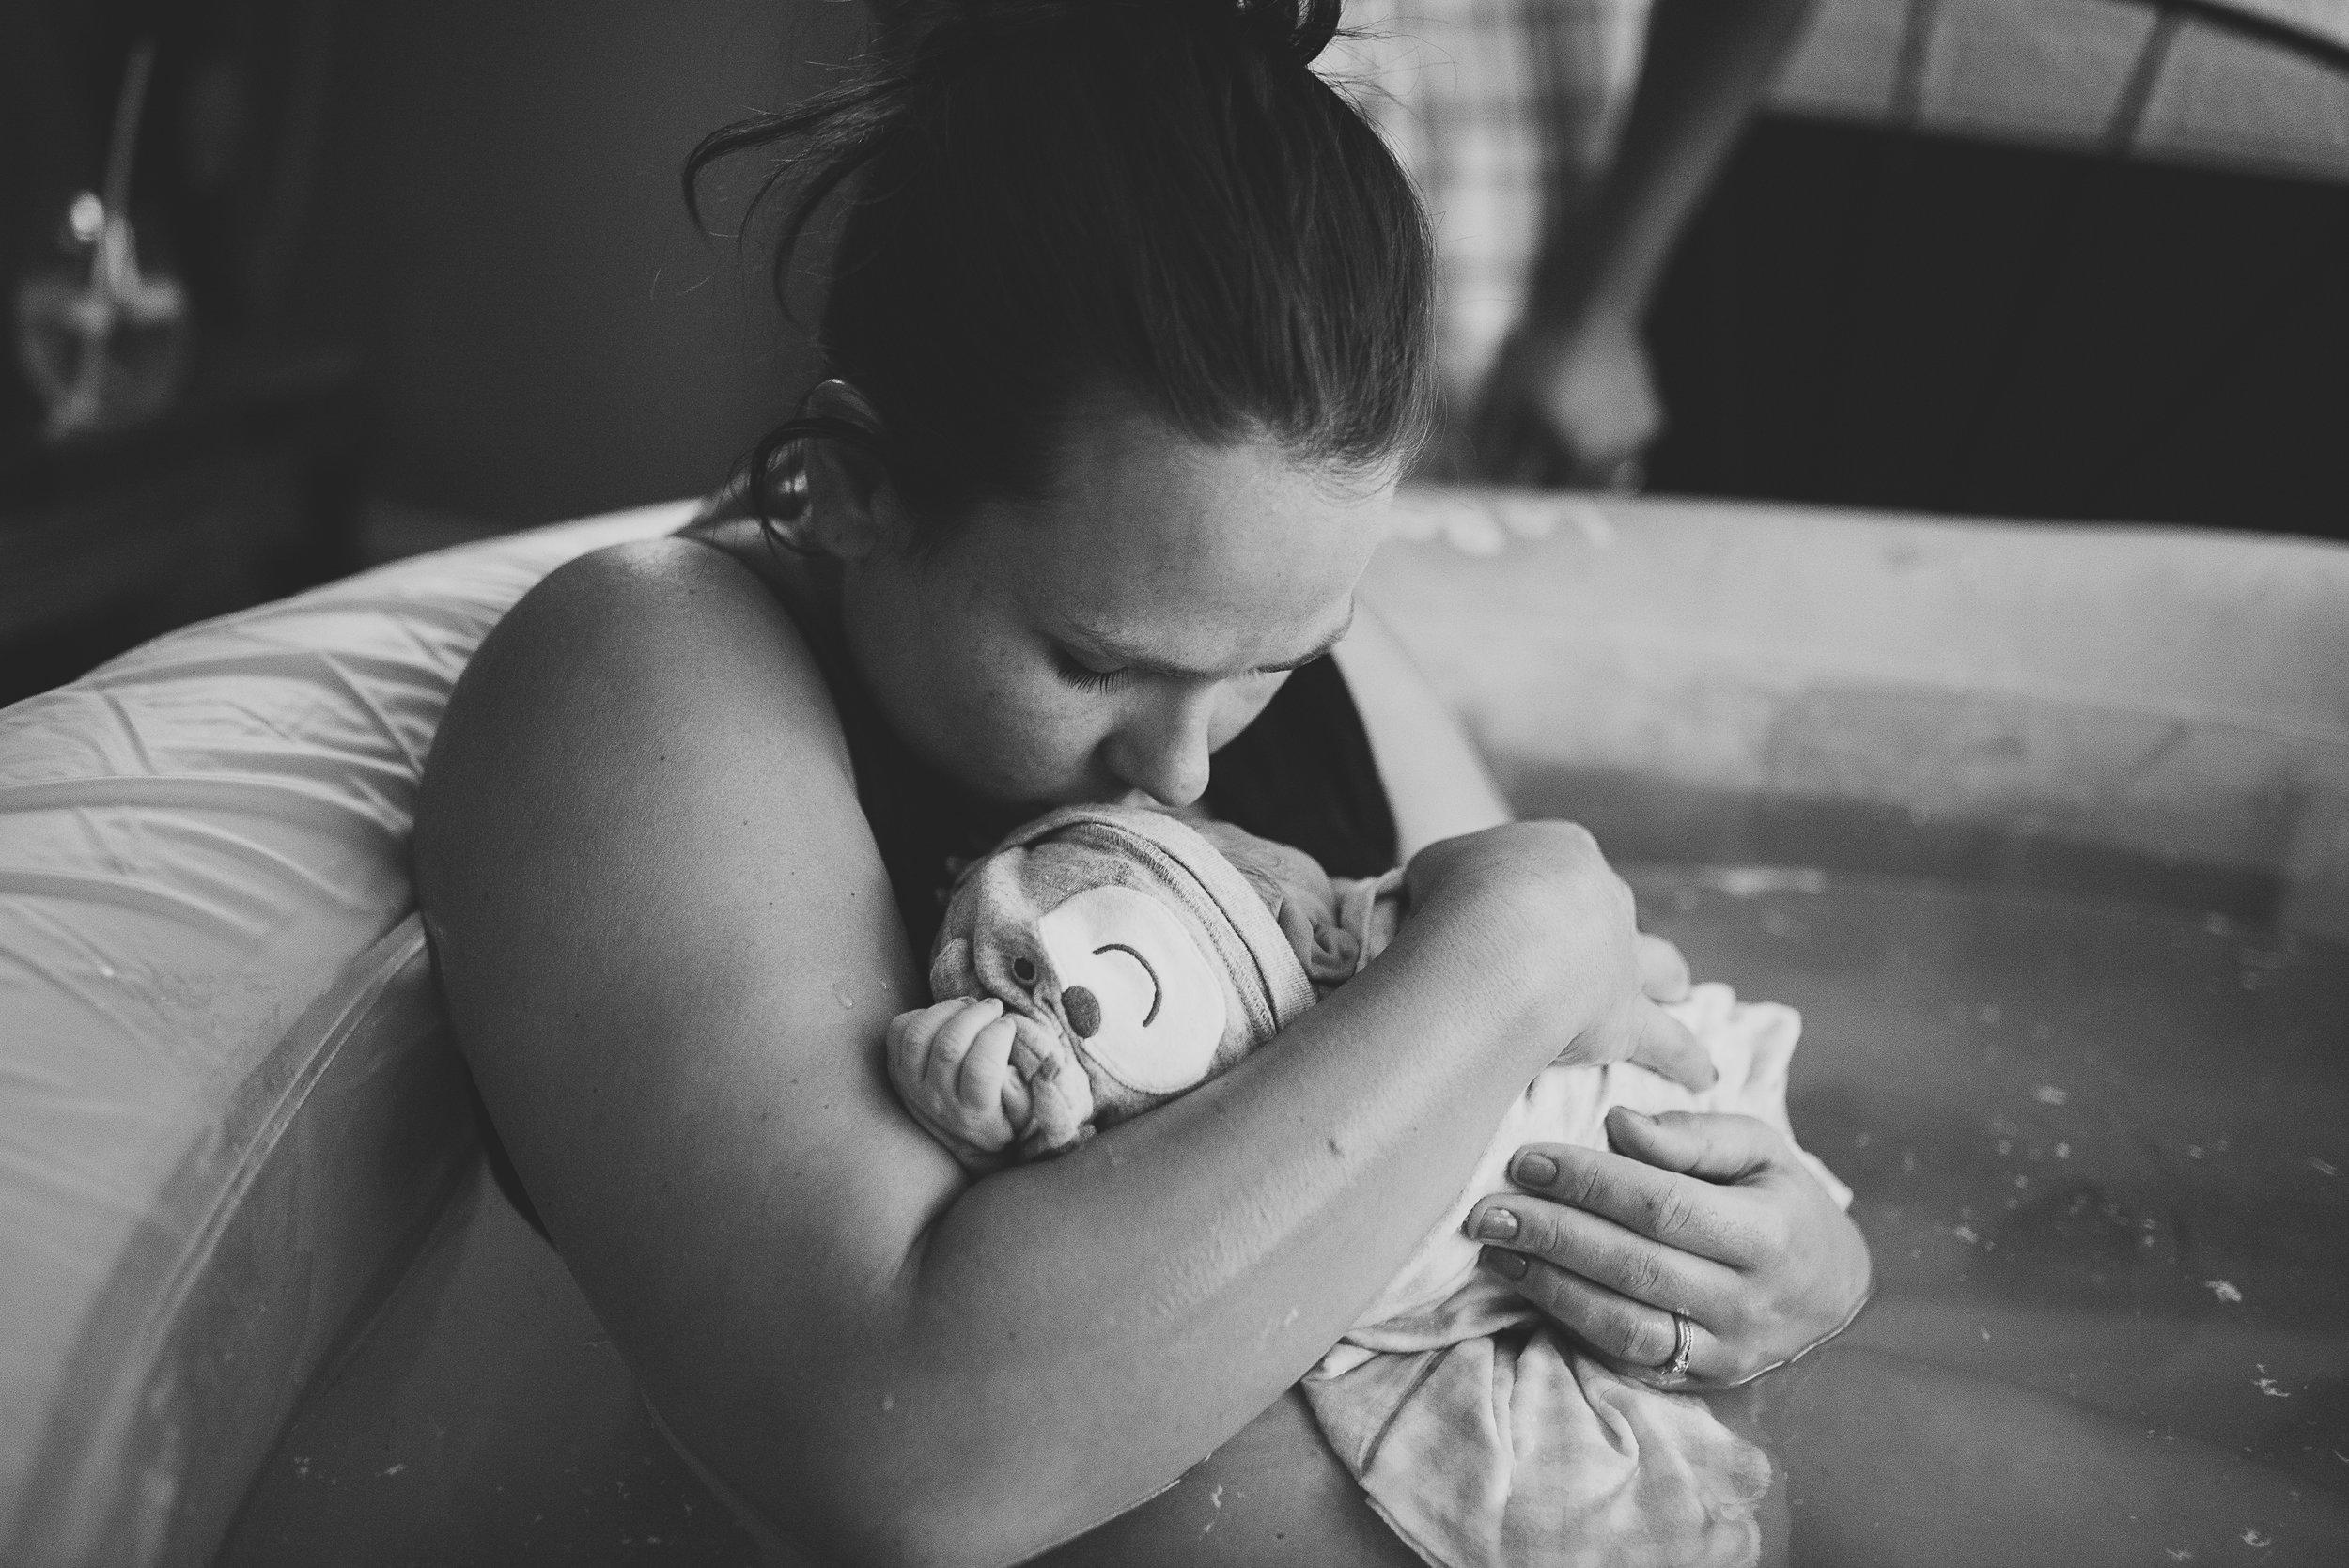 beene-birth-8.1.15-106.jpg